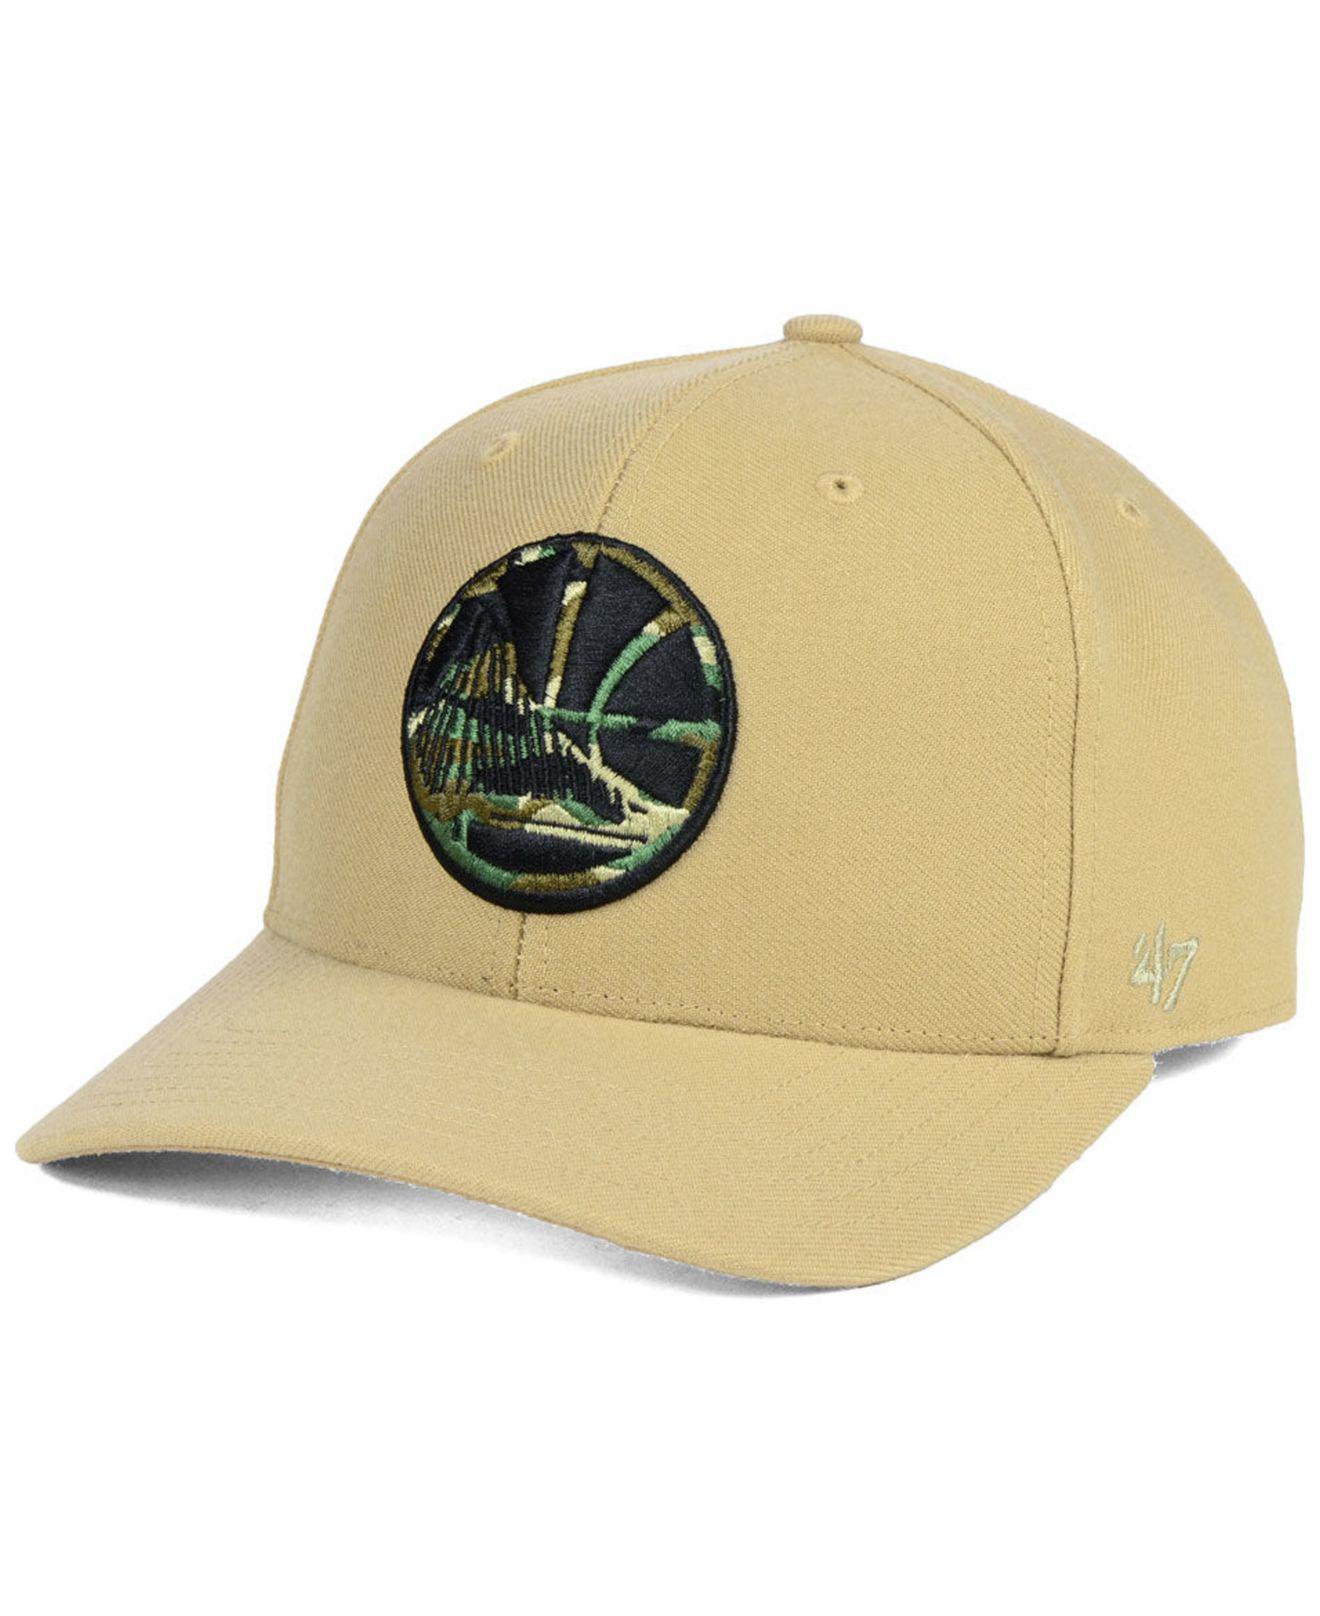 0a86fe2753c Lyst - 47 Brand Golden State Warriors Camfill Mvp Cap for Men